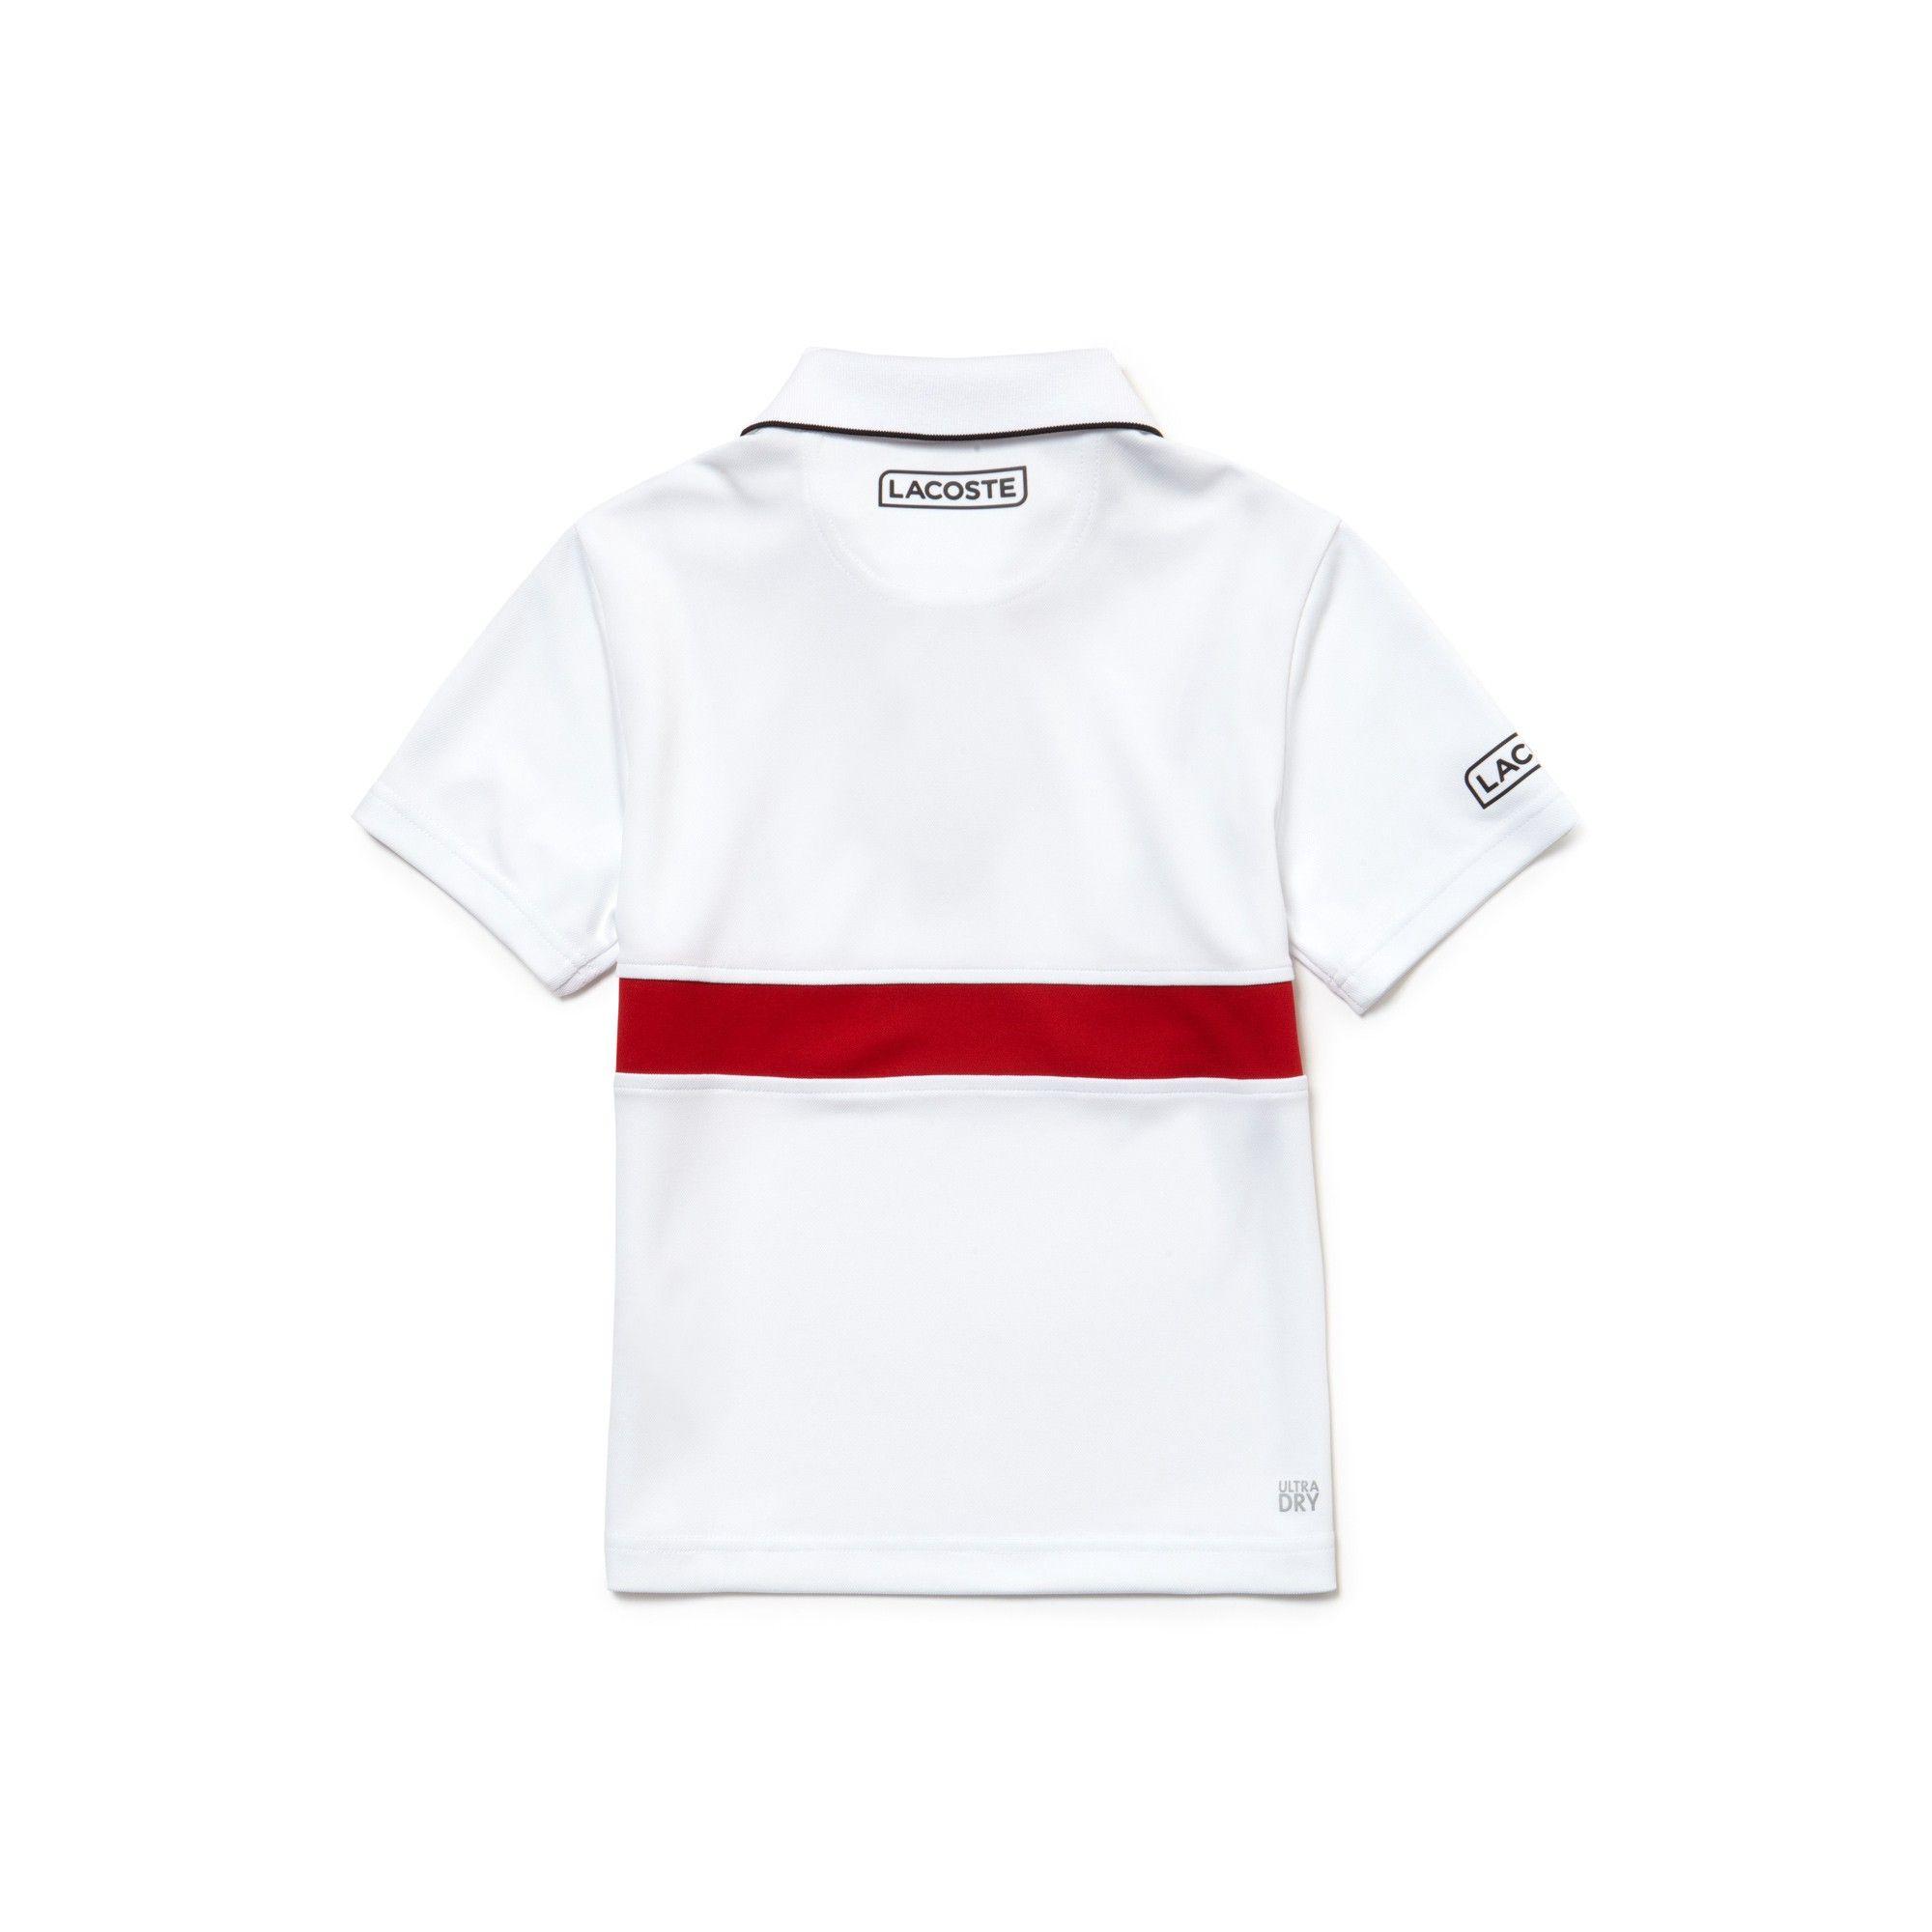 Lacoste Boys  Sport Technical Piqué Polo - Novak Djokovic Collection  White Black-Red 14 Years 35ba94c5a3